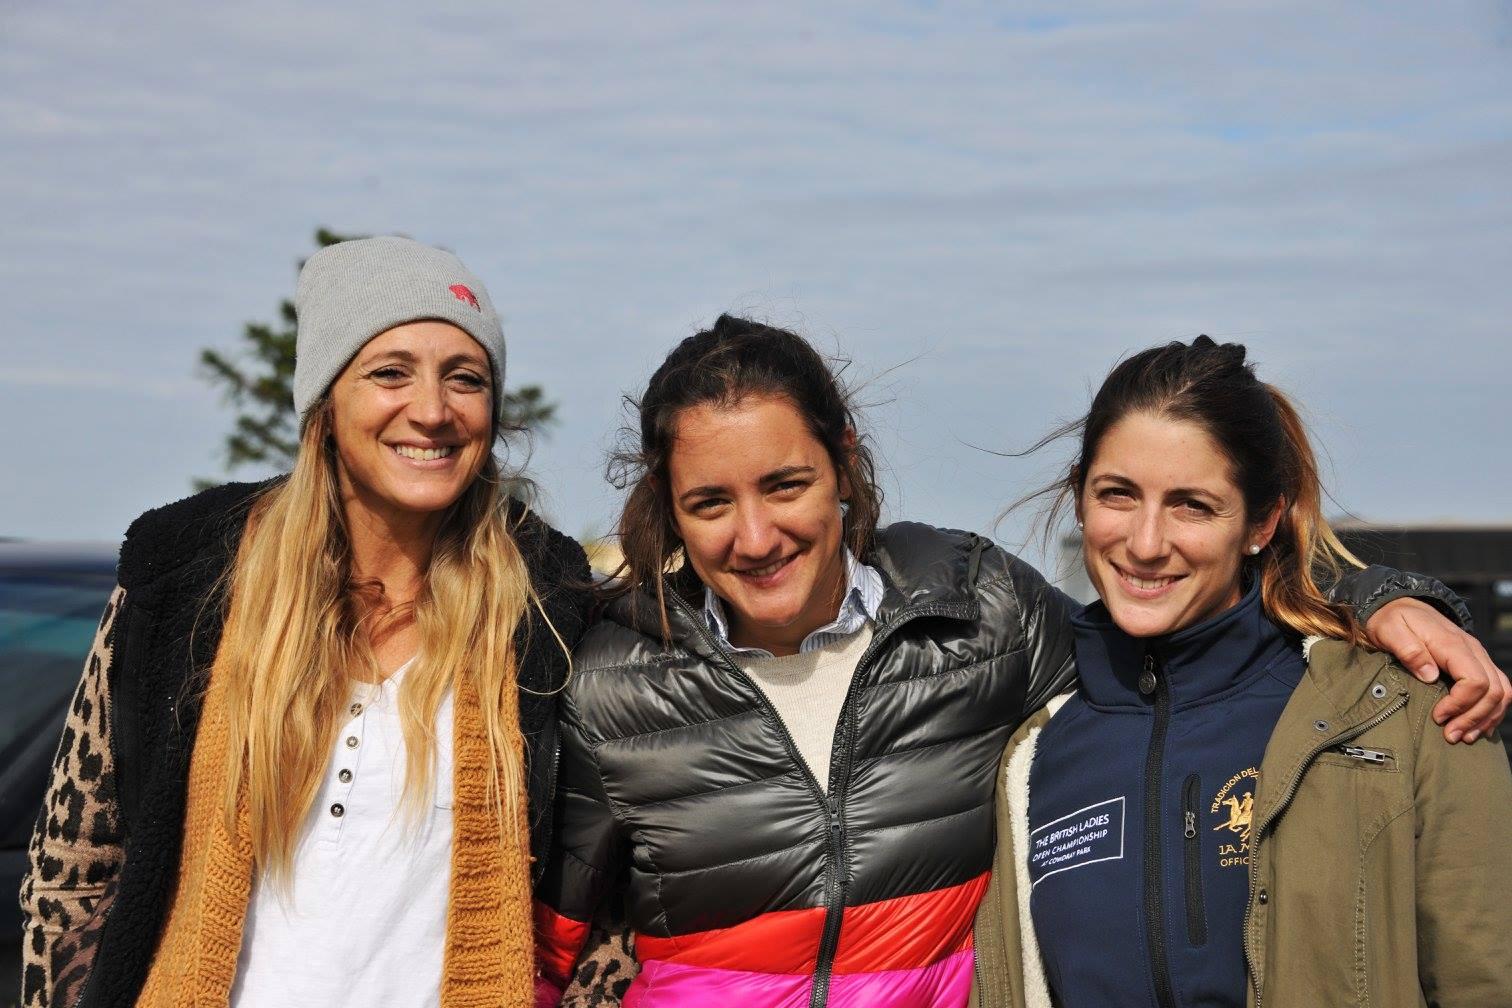 LaProvidencia-LadiesCup-CarlaEsposito-VeroMagnasco-LiaSalvo